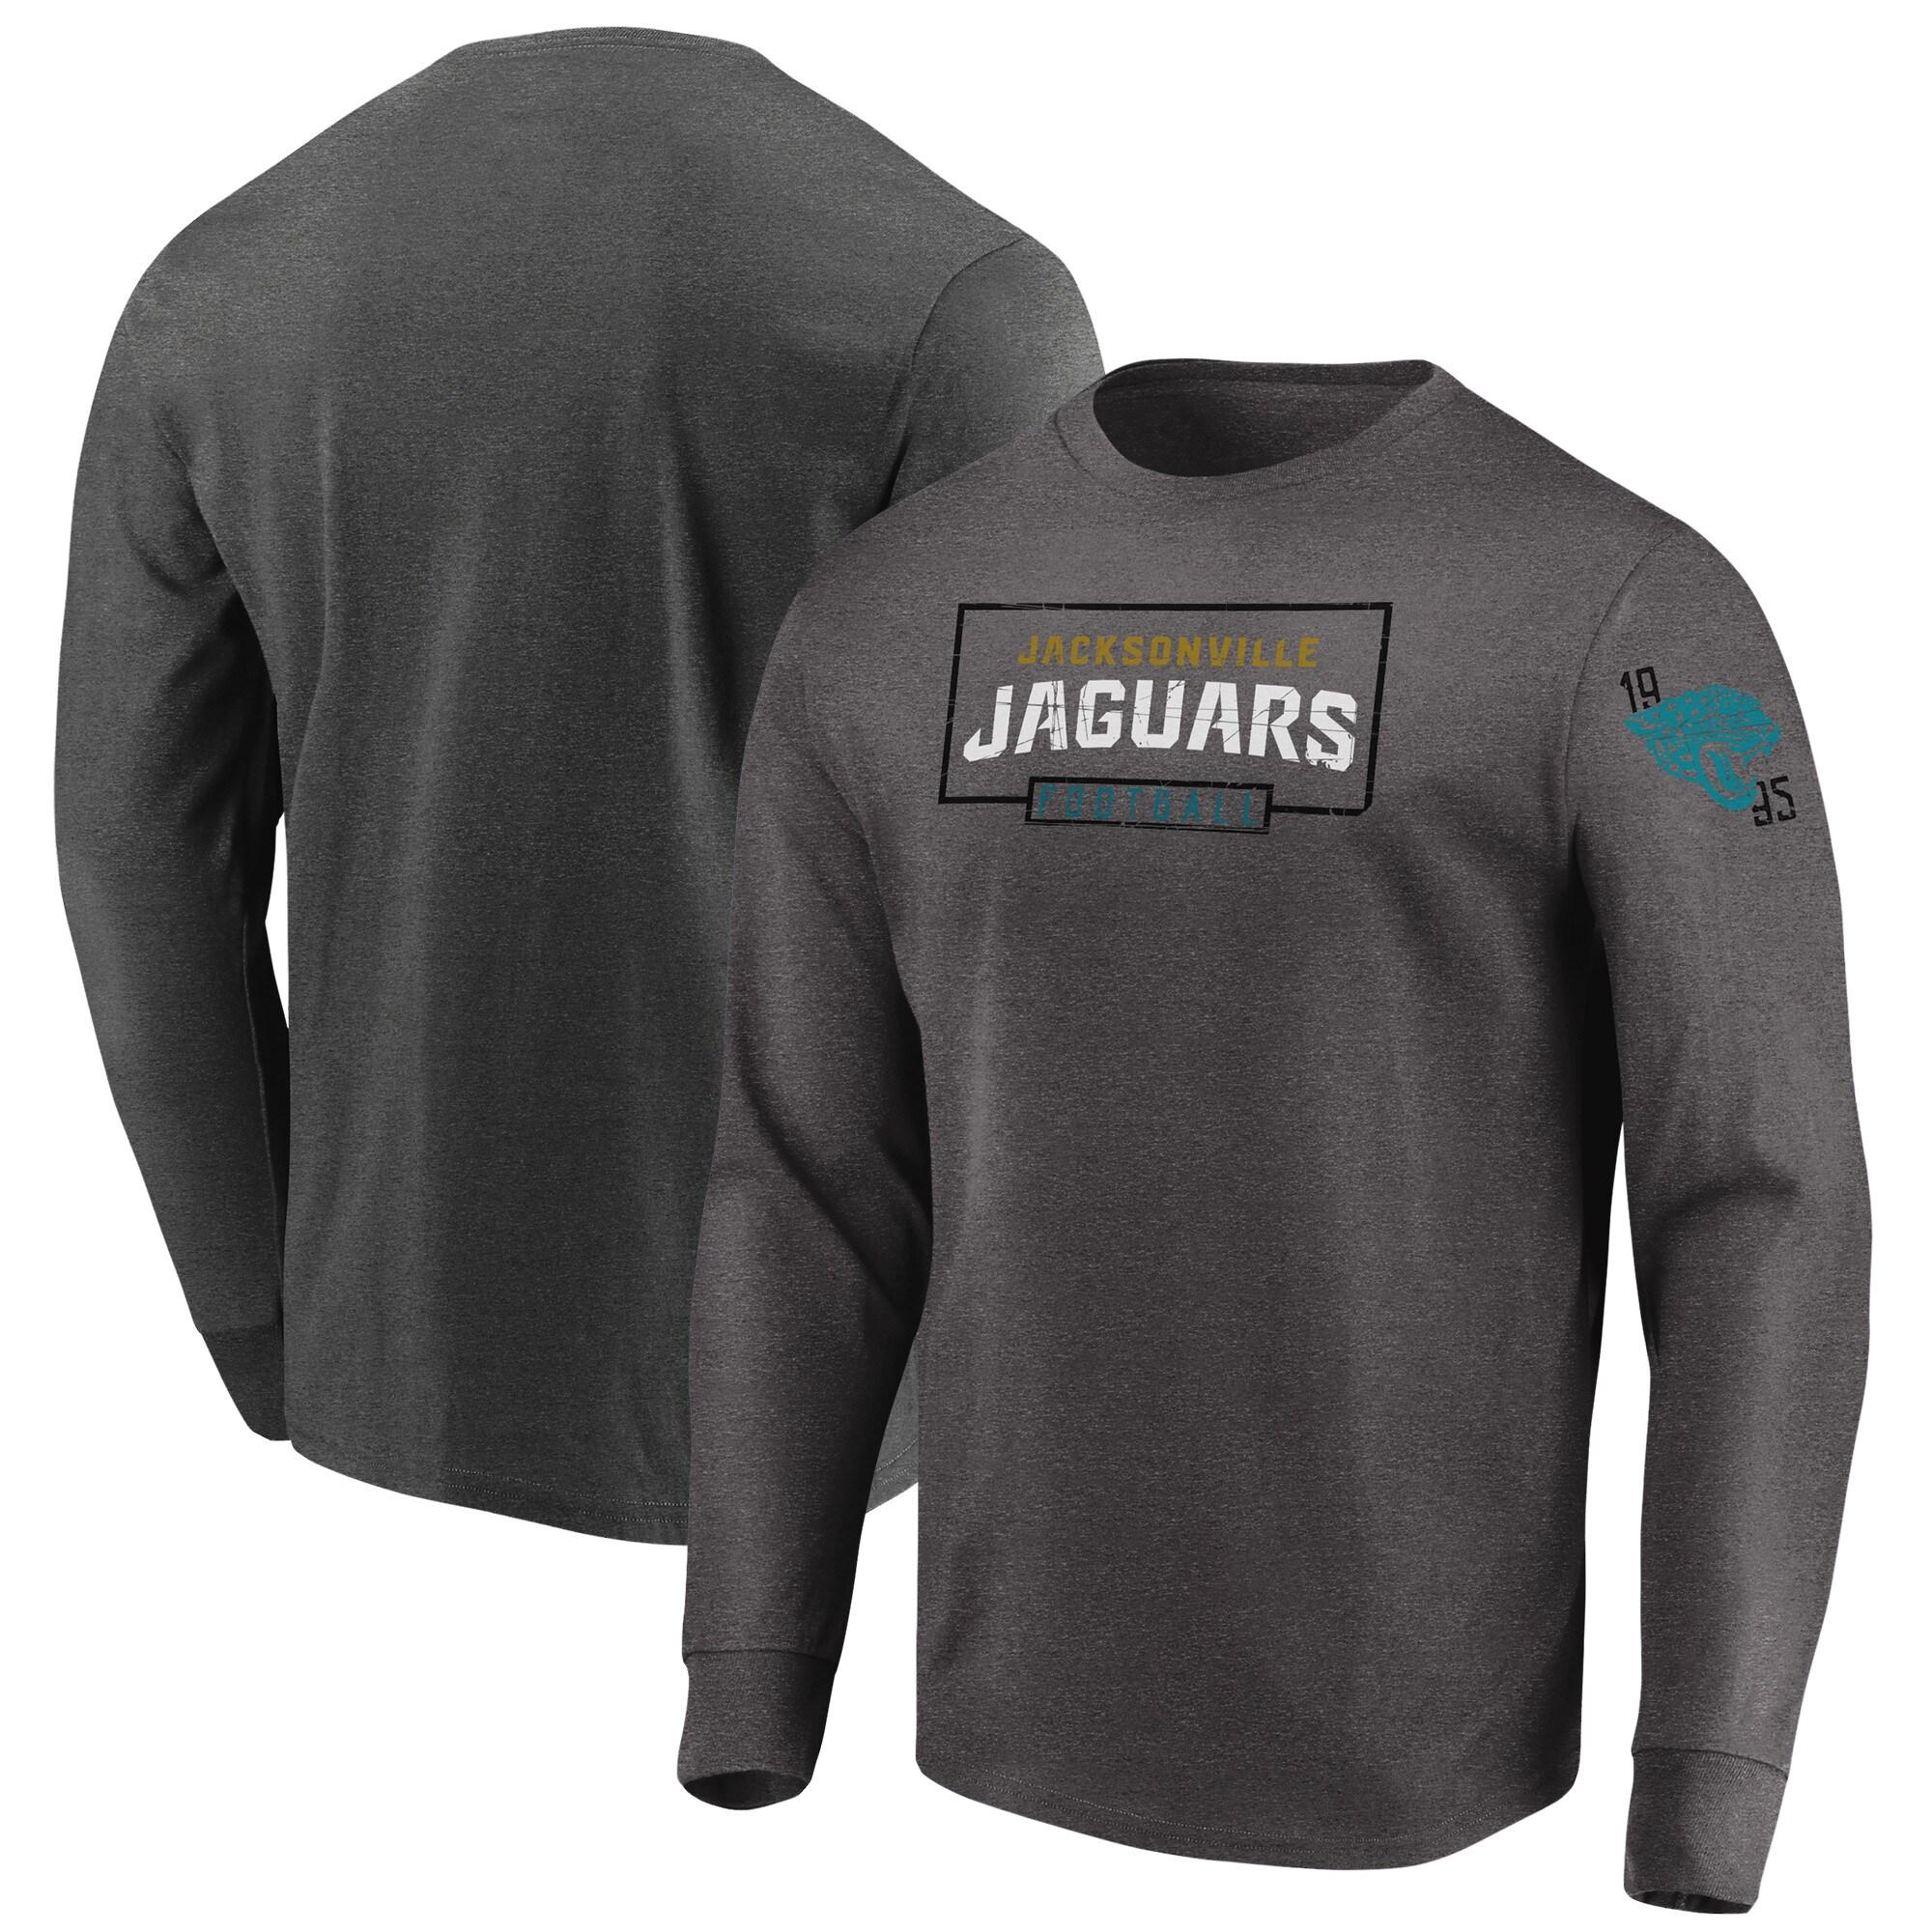 Jacksonville Jaguars Majestic Big & Tall Kick Return Long Sleeve T-Shirt - Heathered Charcoal